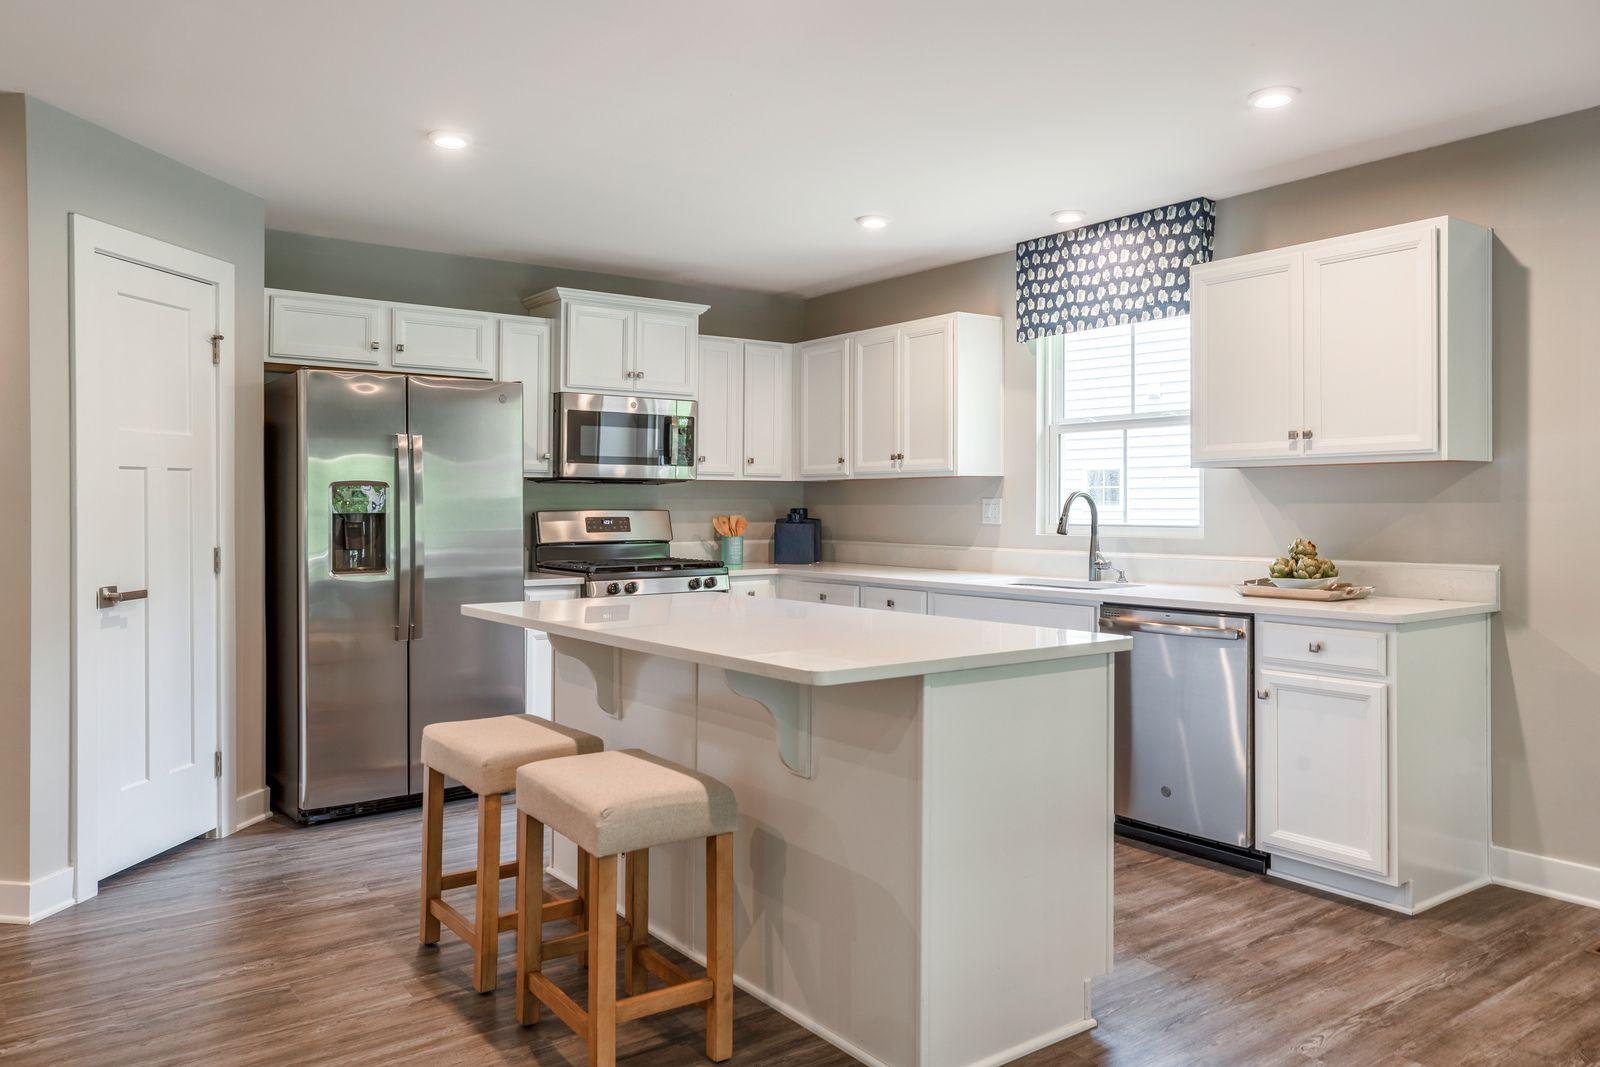 'Durbin Oaks' by Ryan Homes-GVS in Greenville-Spartanburg